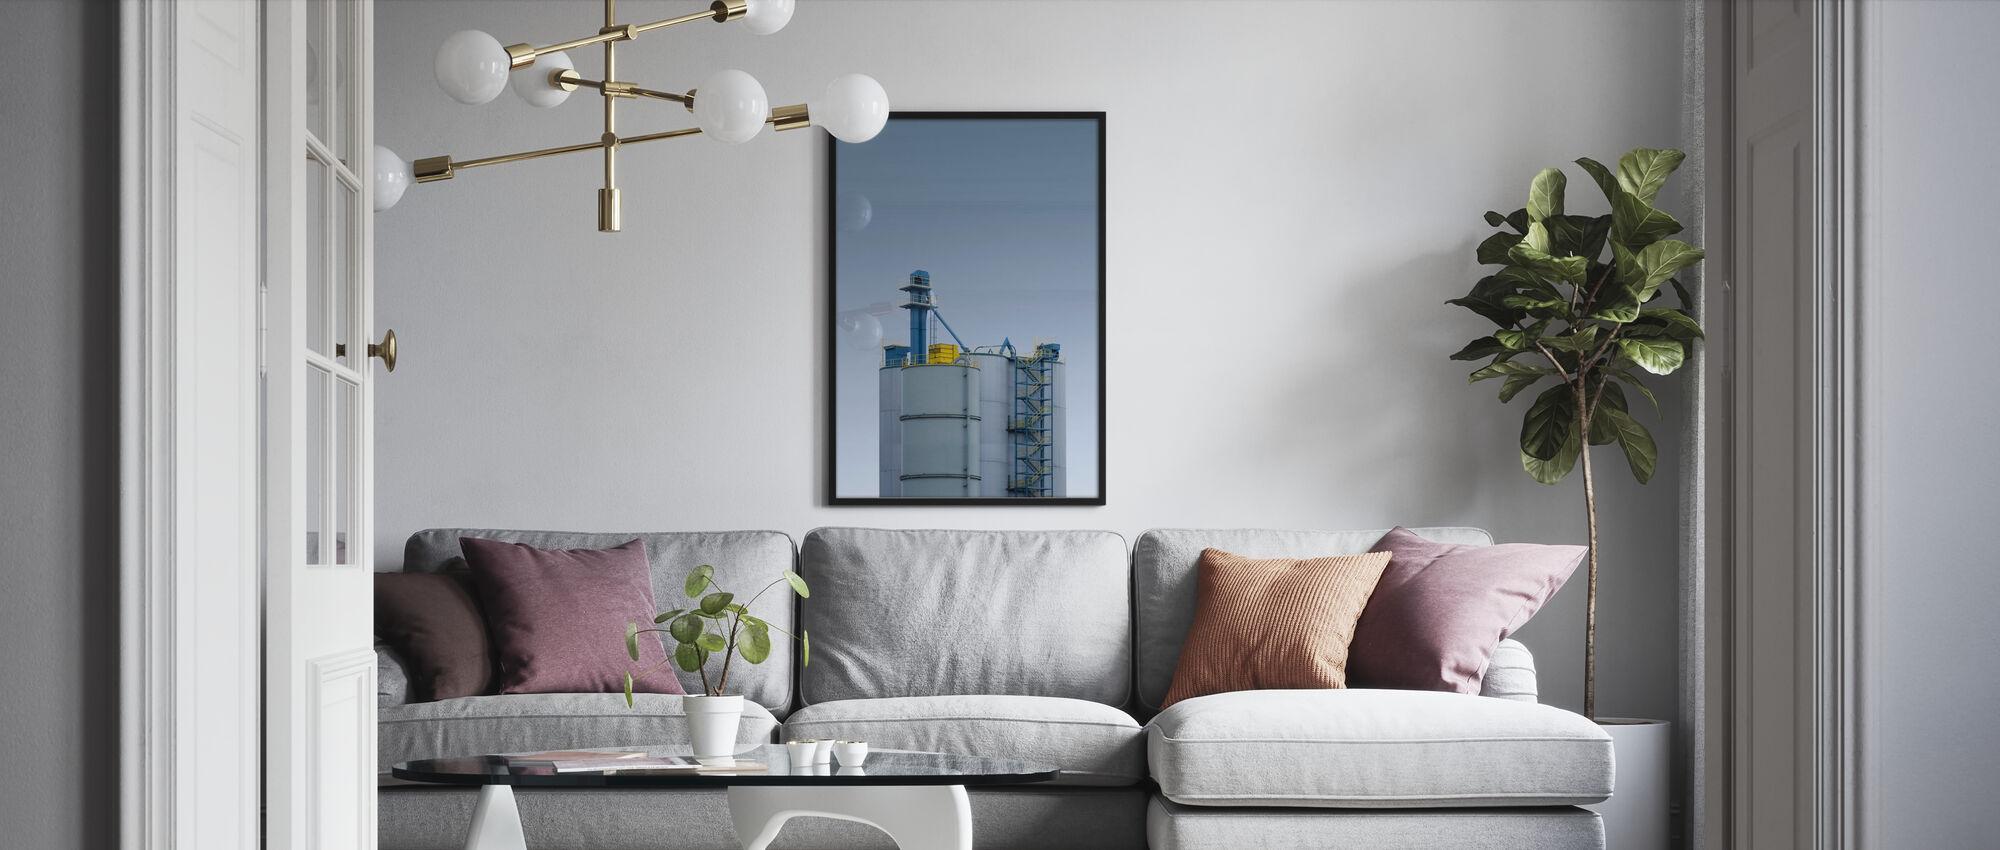 Barrel - Poster - Living Room